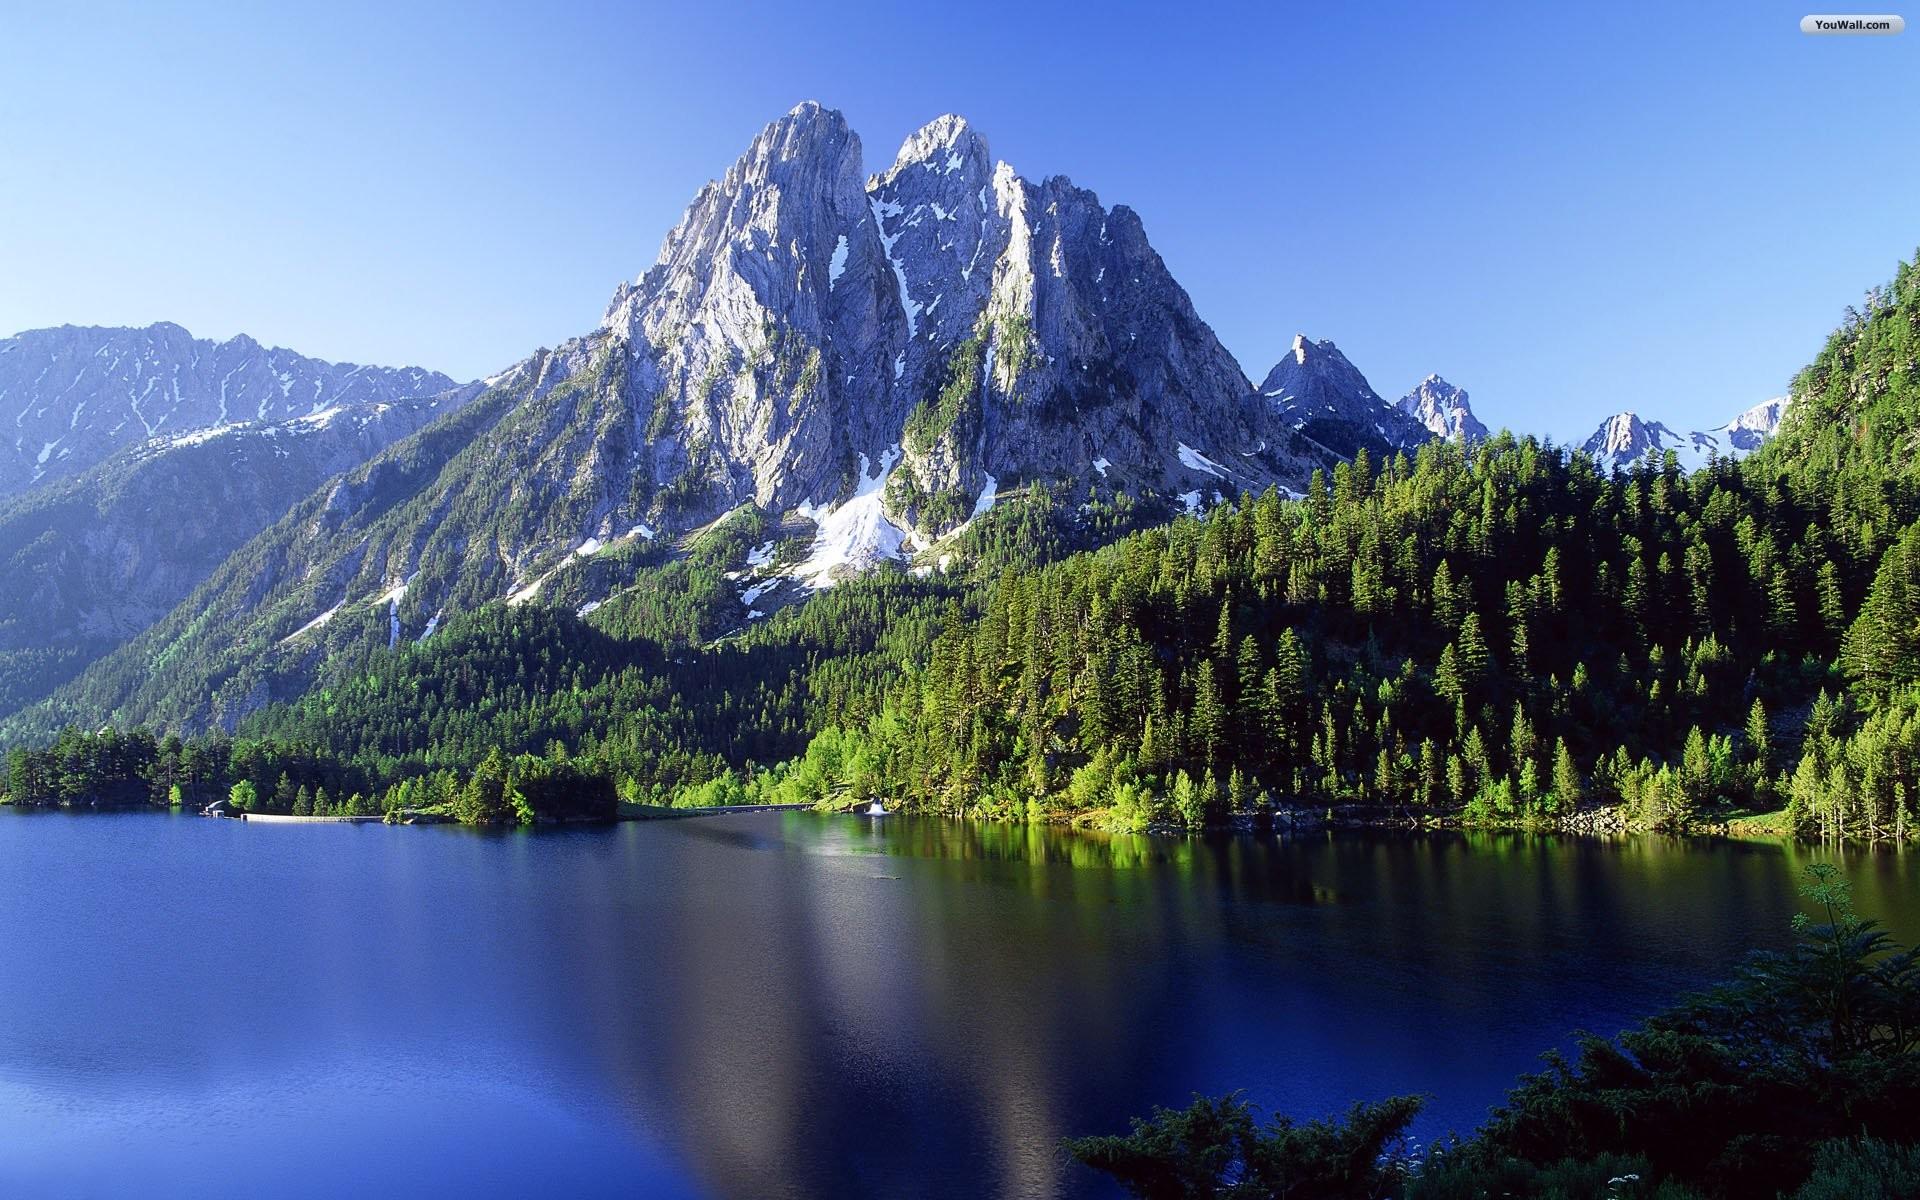 Wonderful Landscape Wallpaper Backgrounds